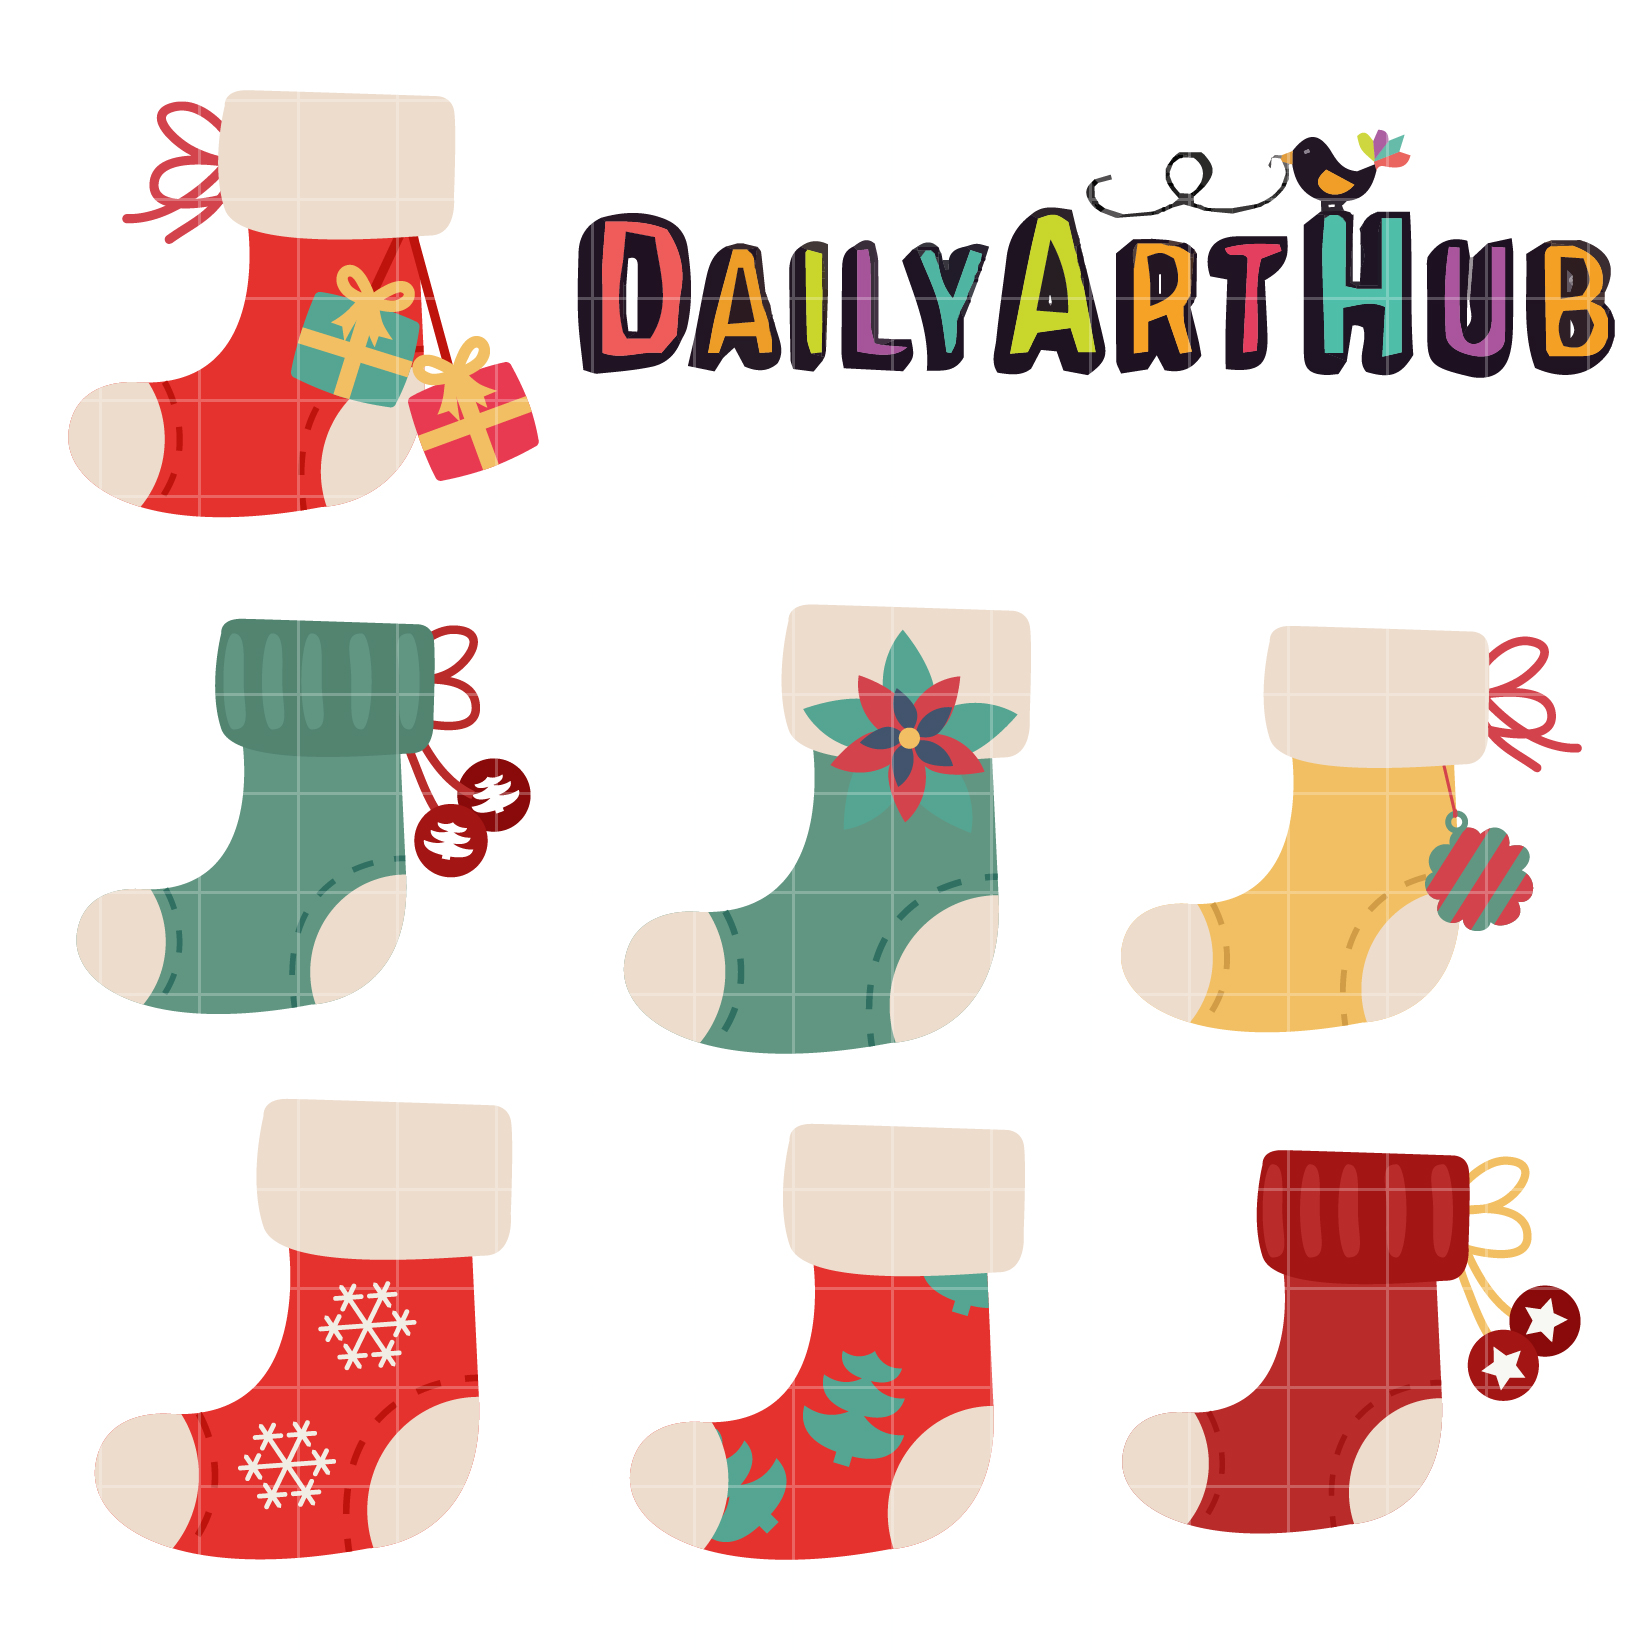 Christmas Socks Clip Art Set - Daily Art Hub - Free Clip ... (1650 x 1650 Pixel)